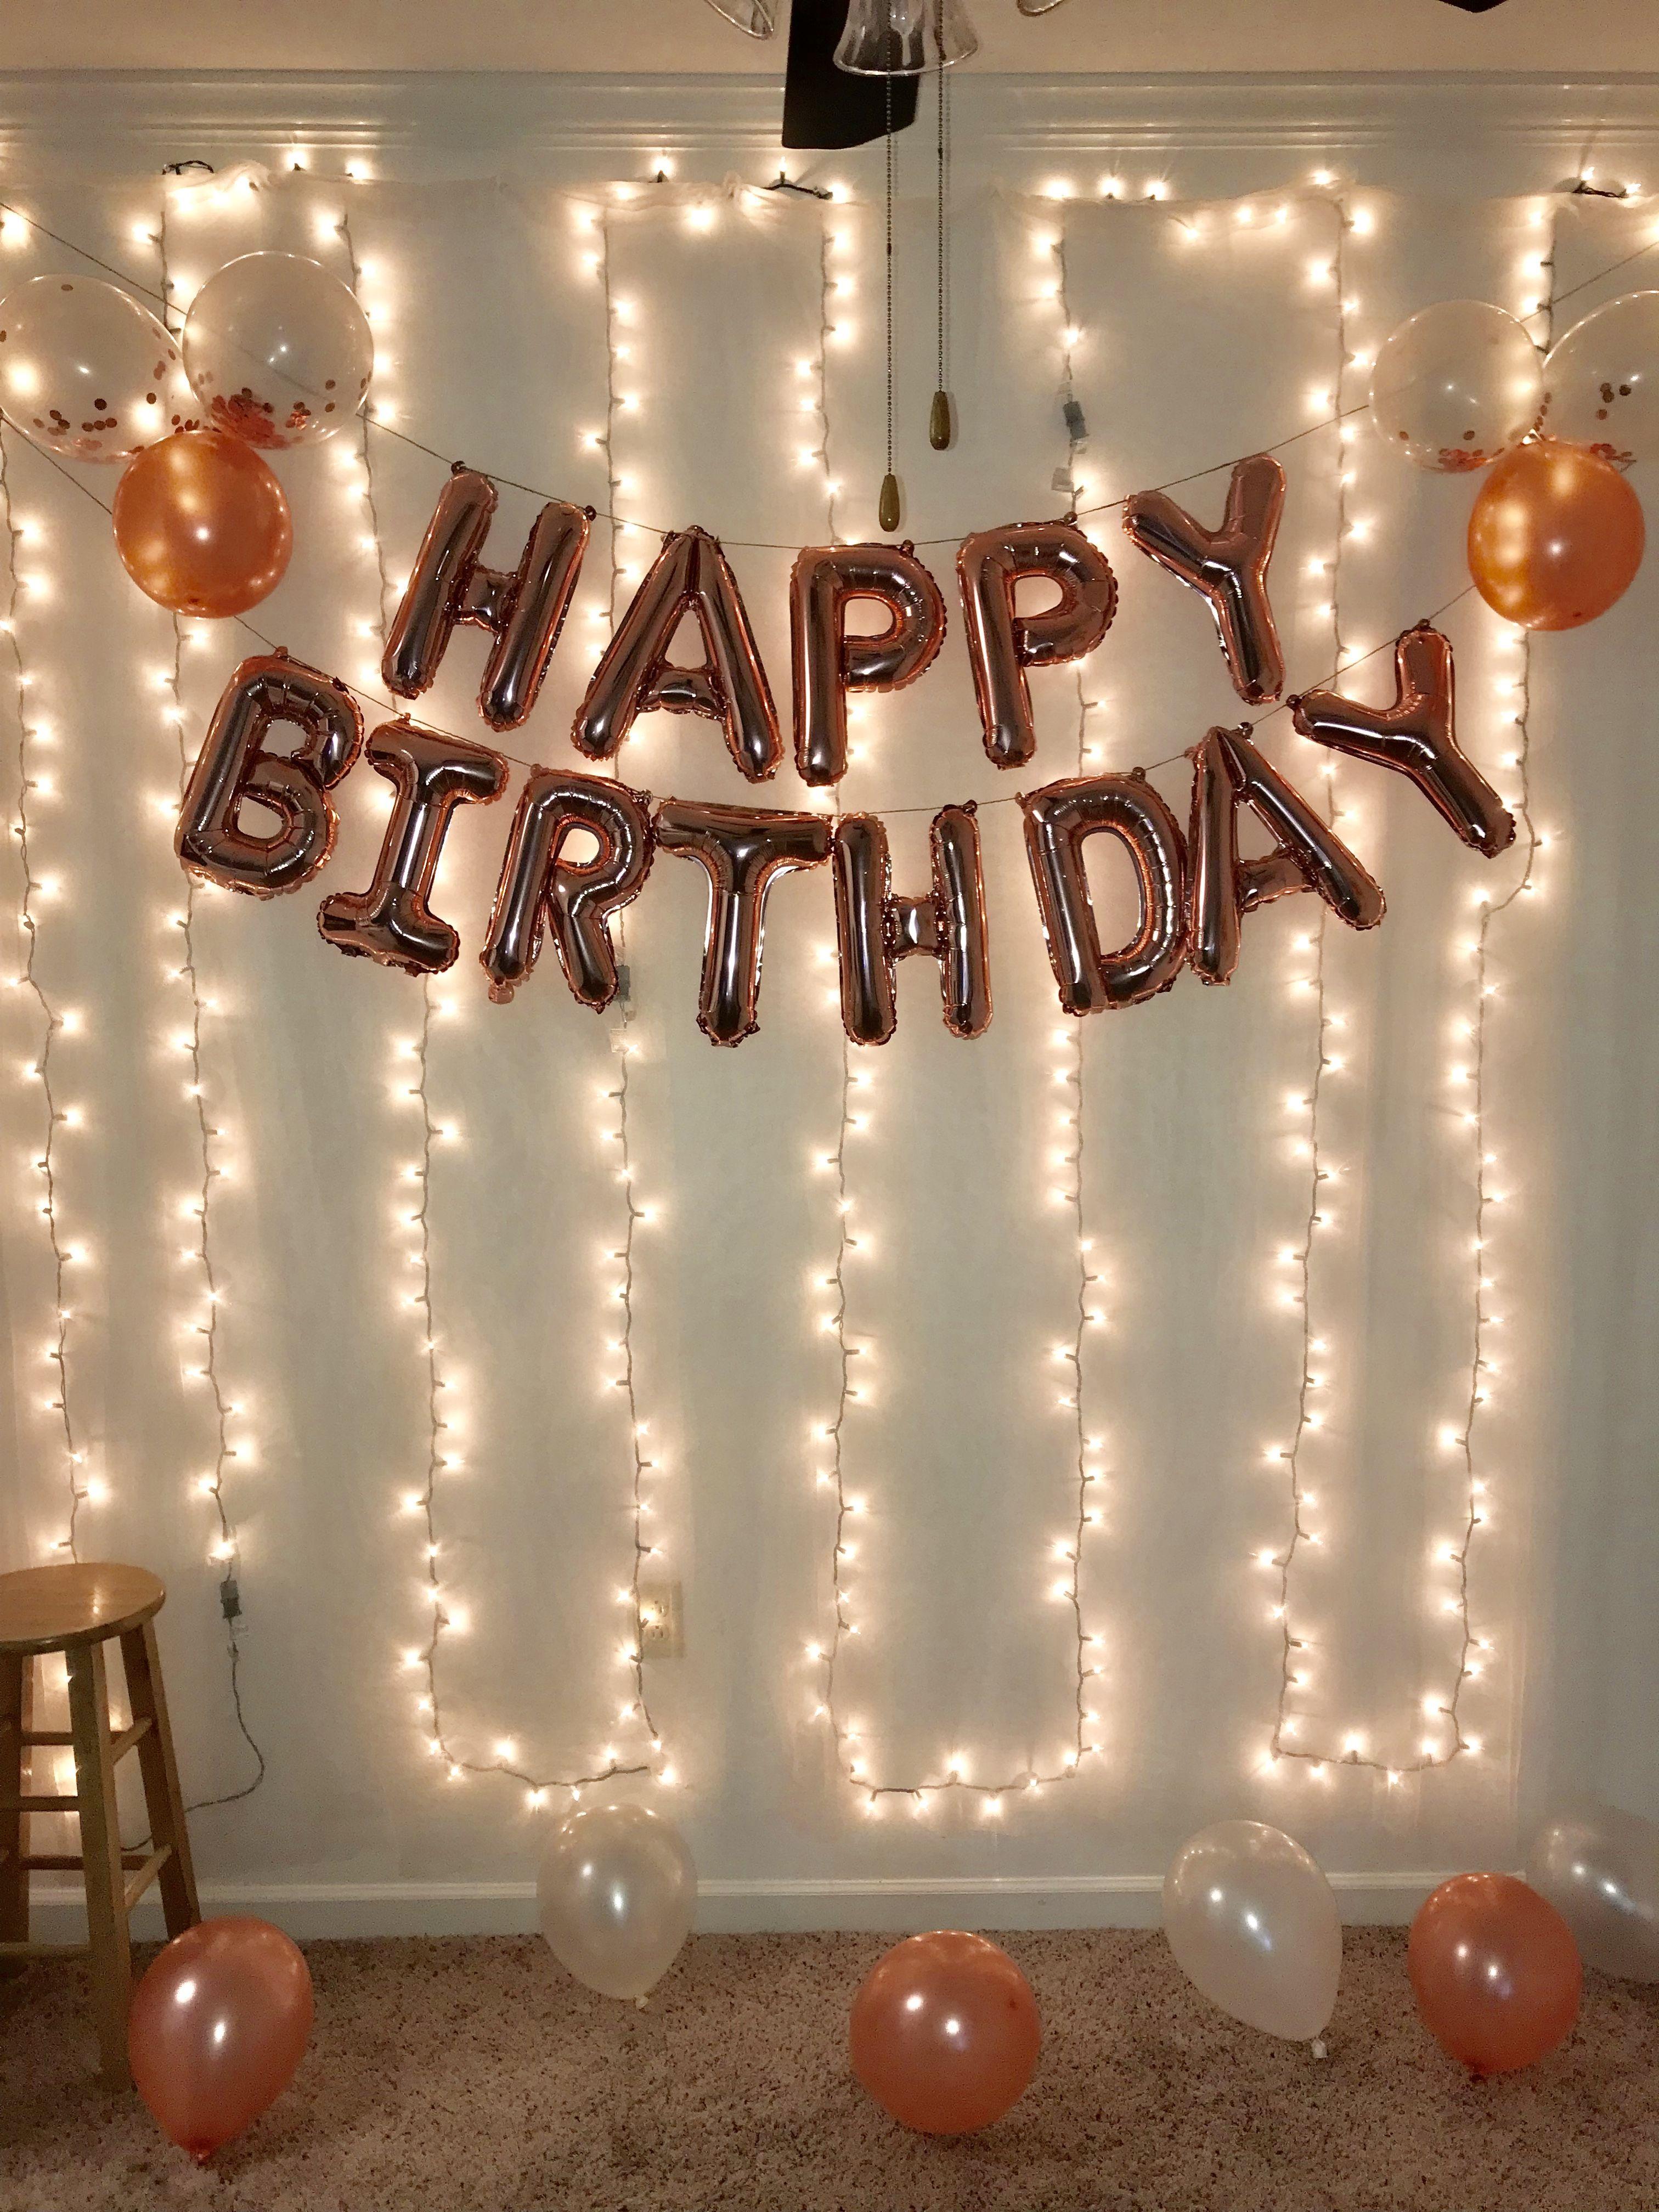 21st Birthday Party Backdrop #17thbirthday